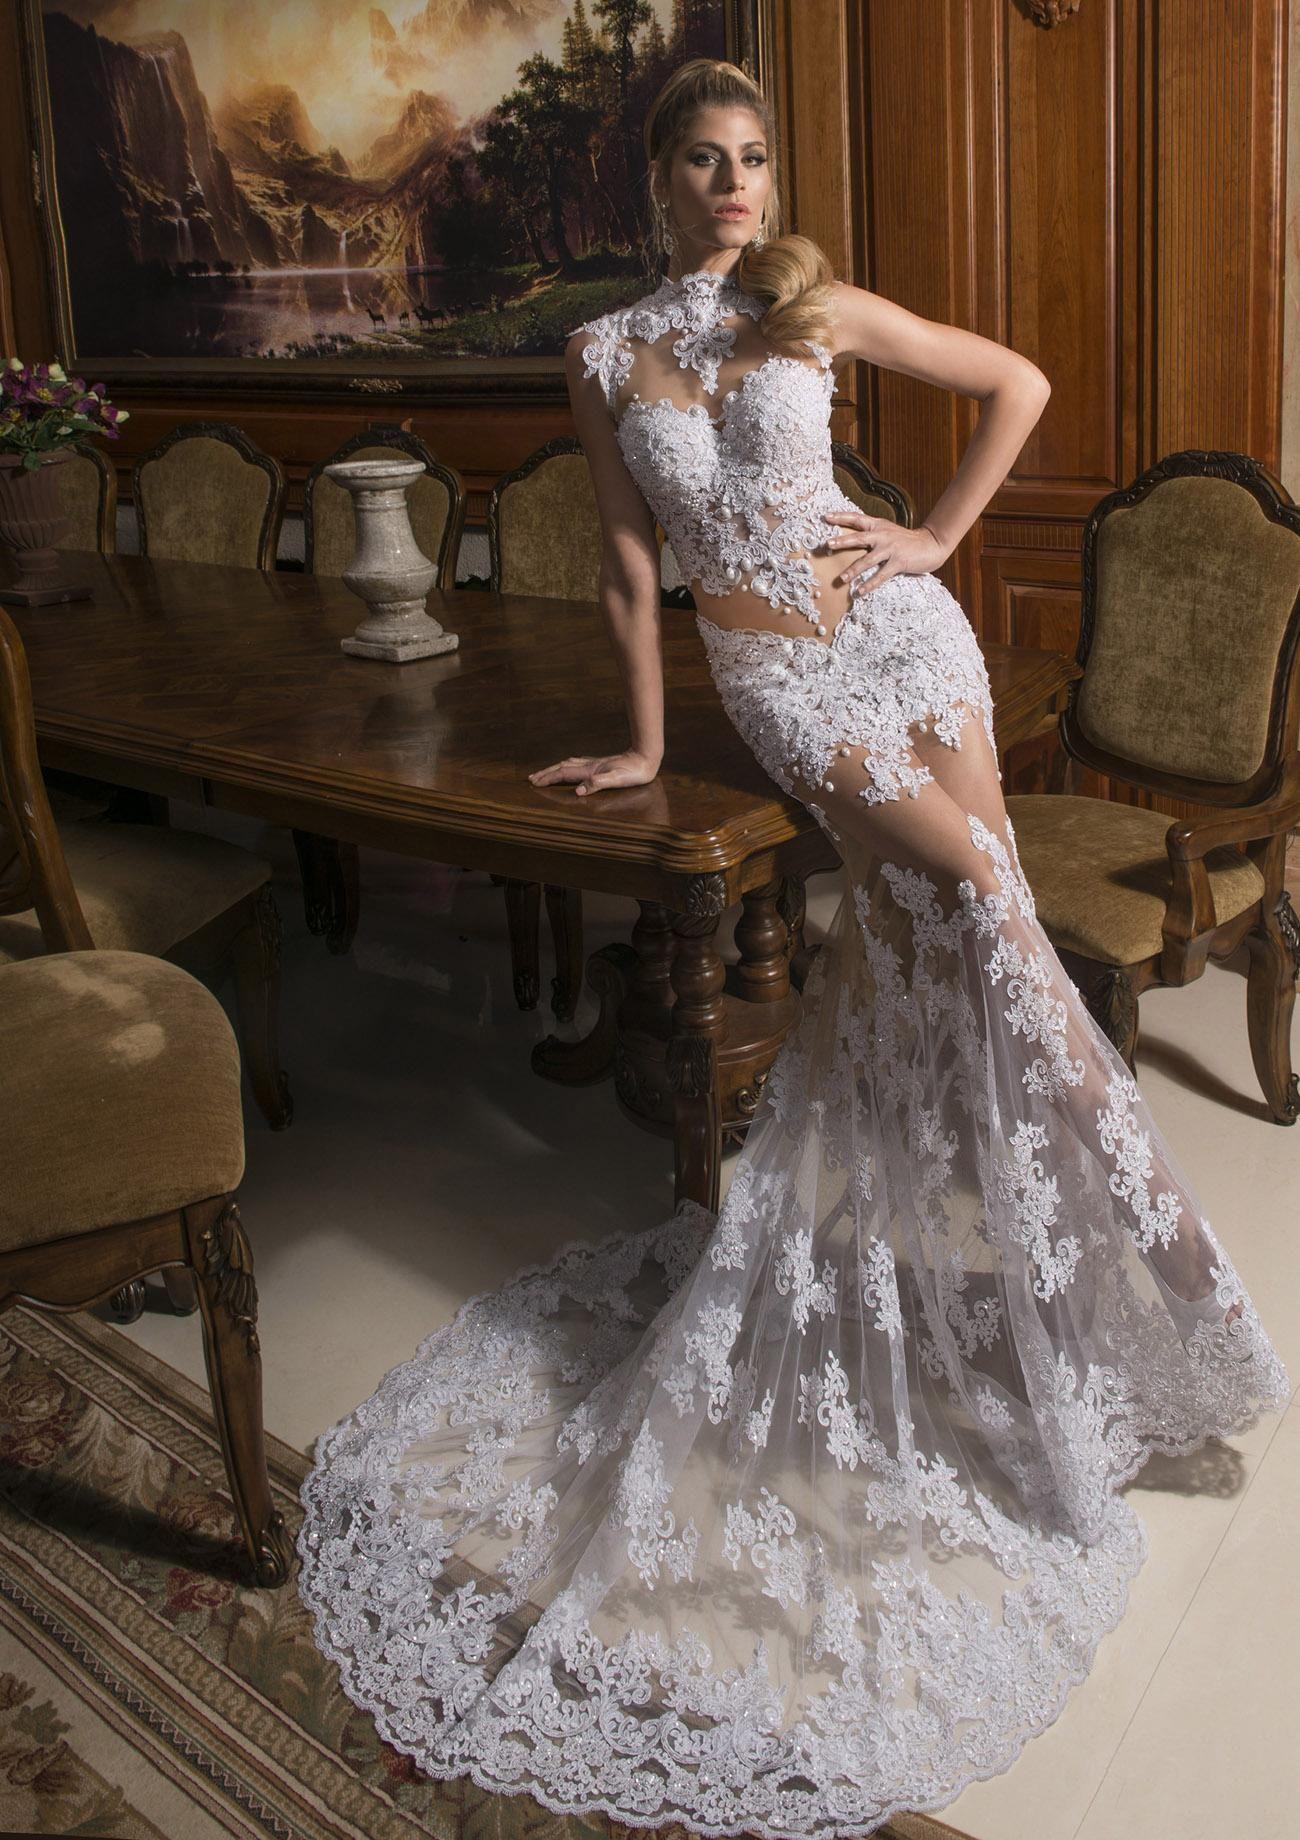 Lace Bustier 2 Piece Wedding Dress